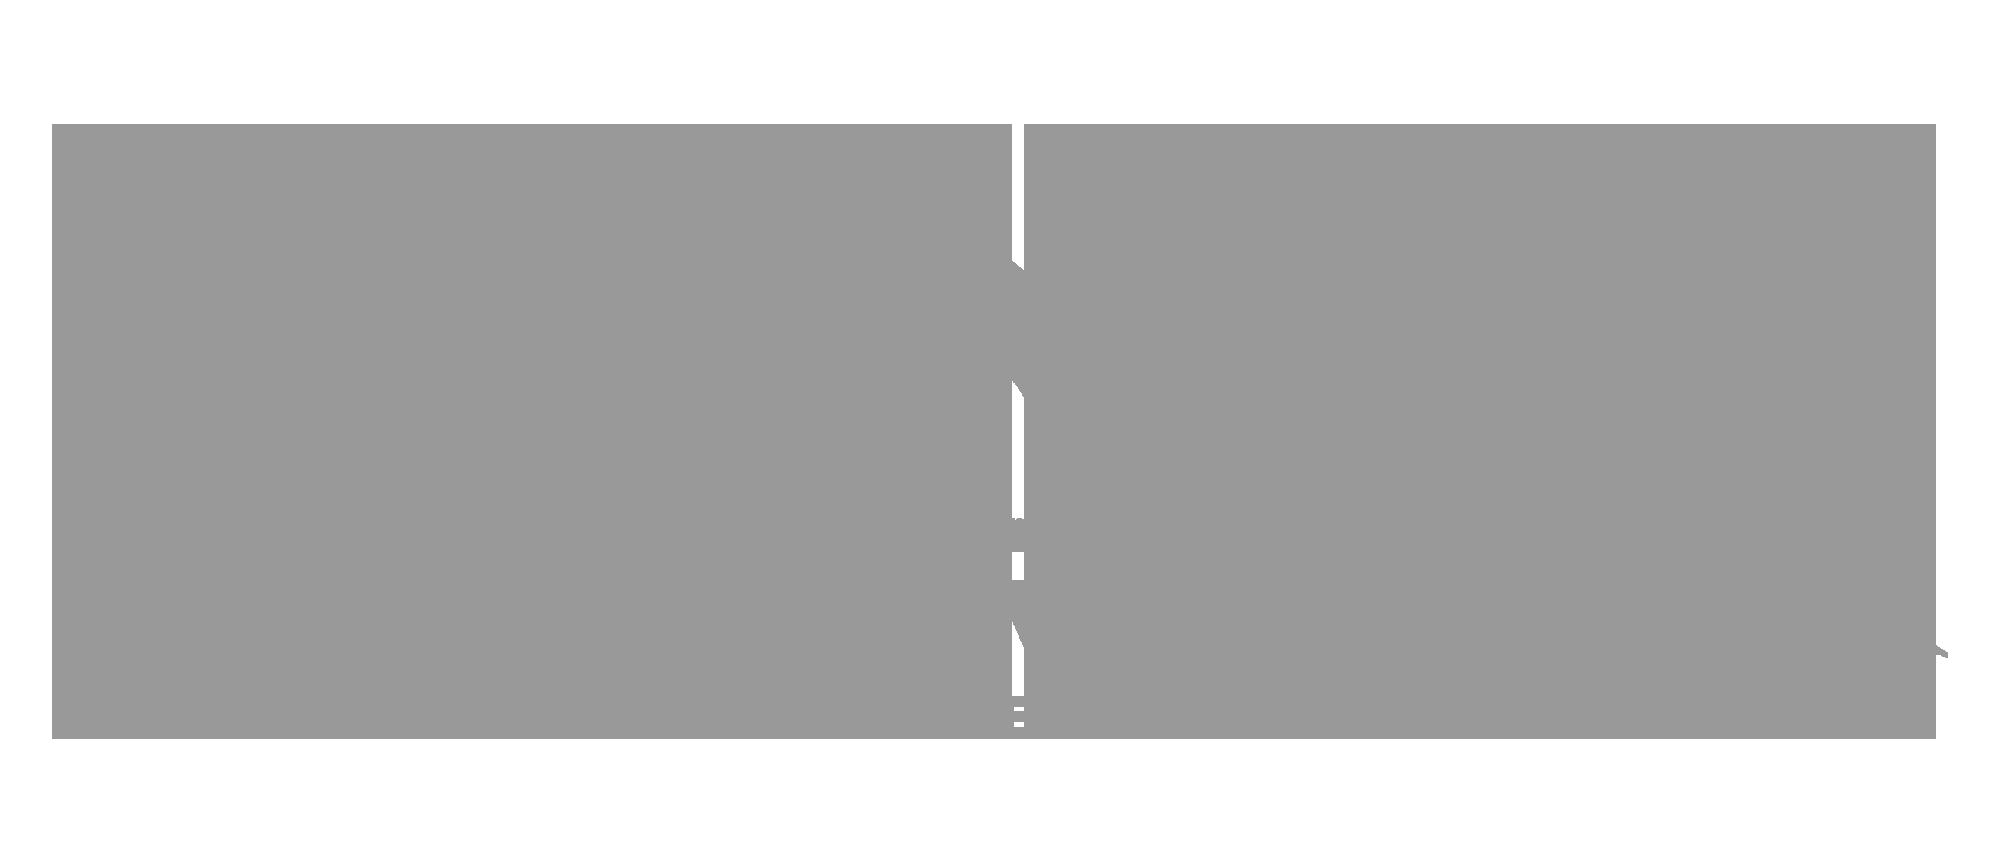 ruggedridge_nowords_opacity_new